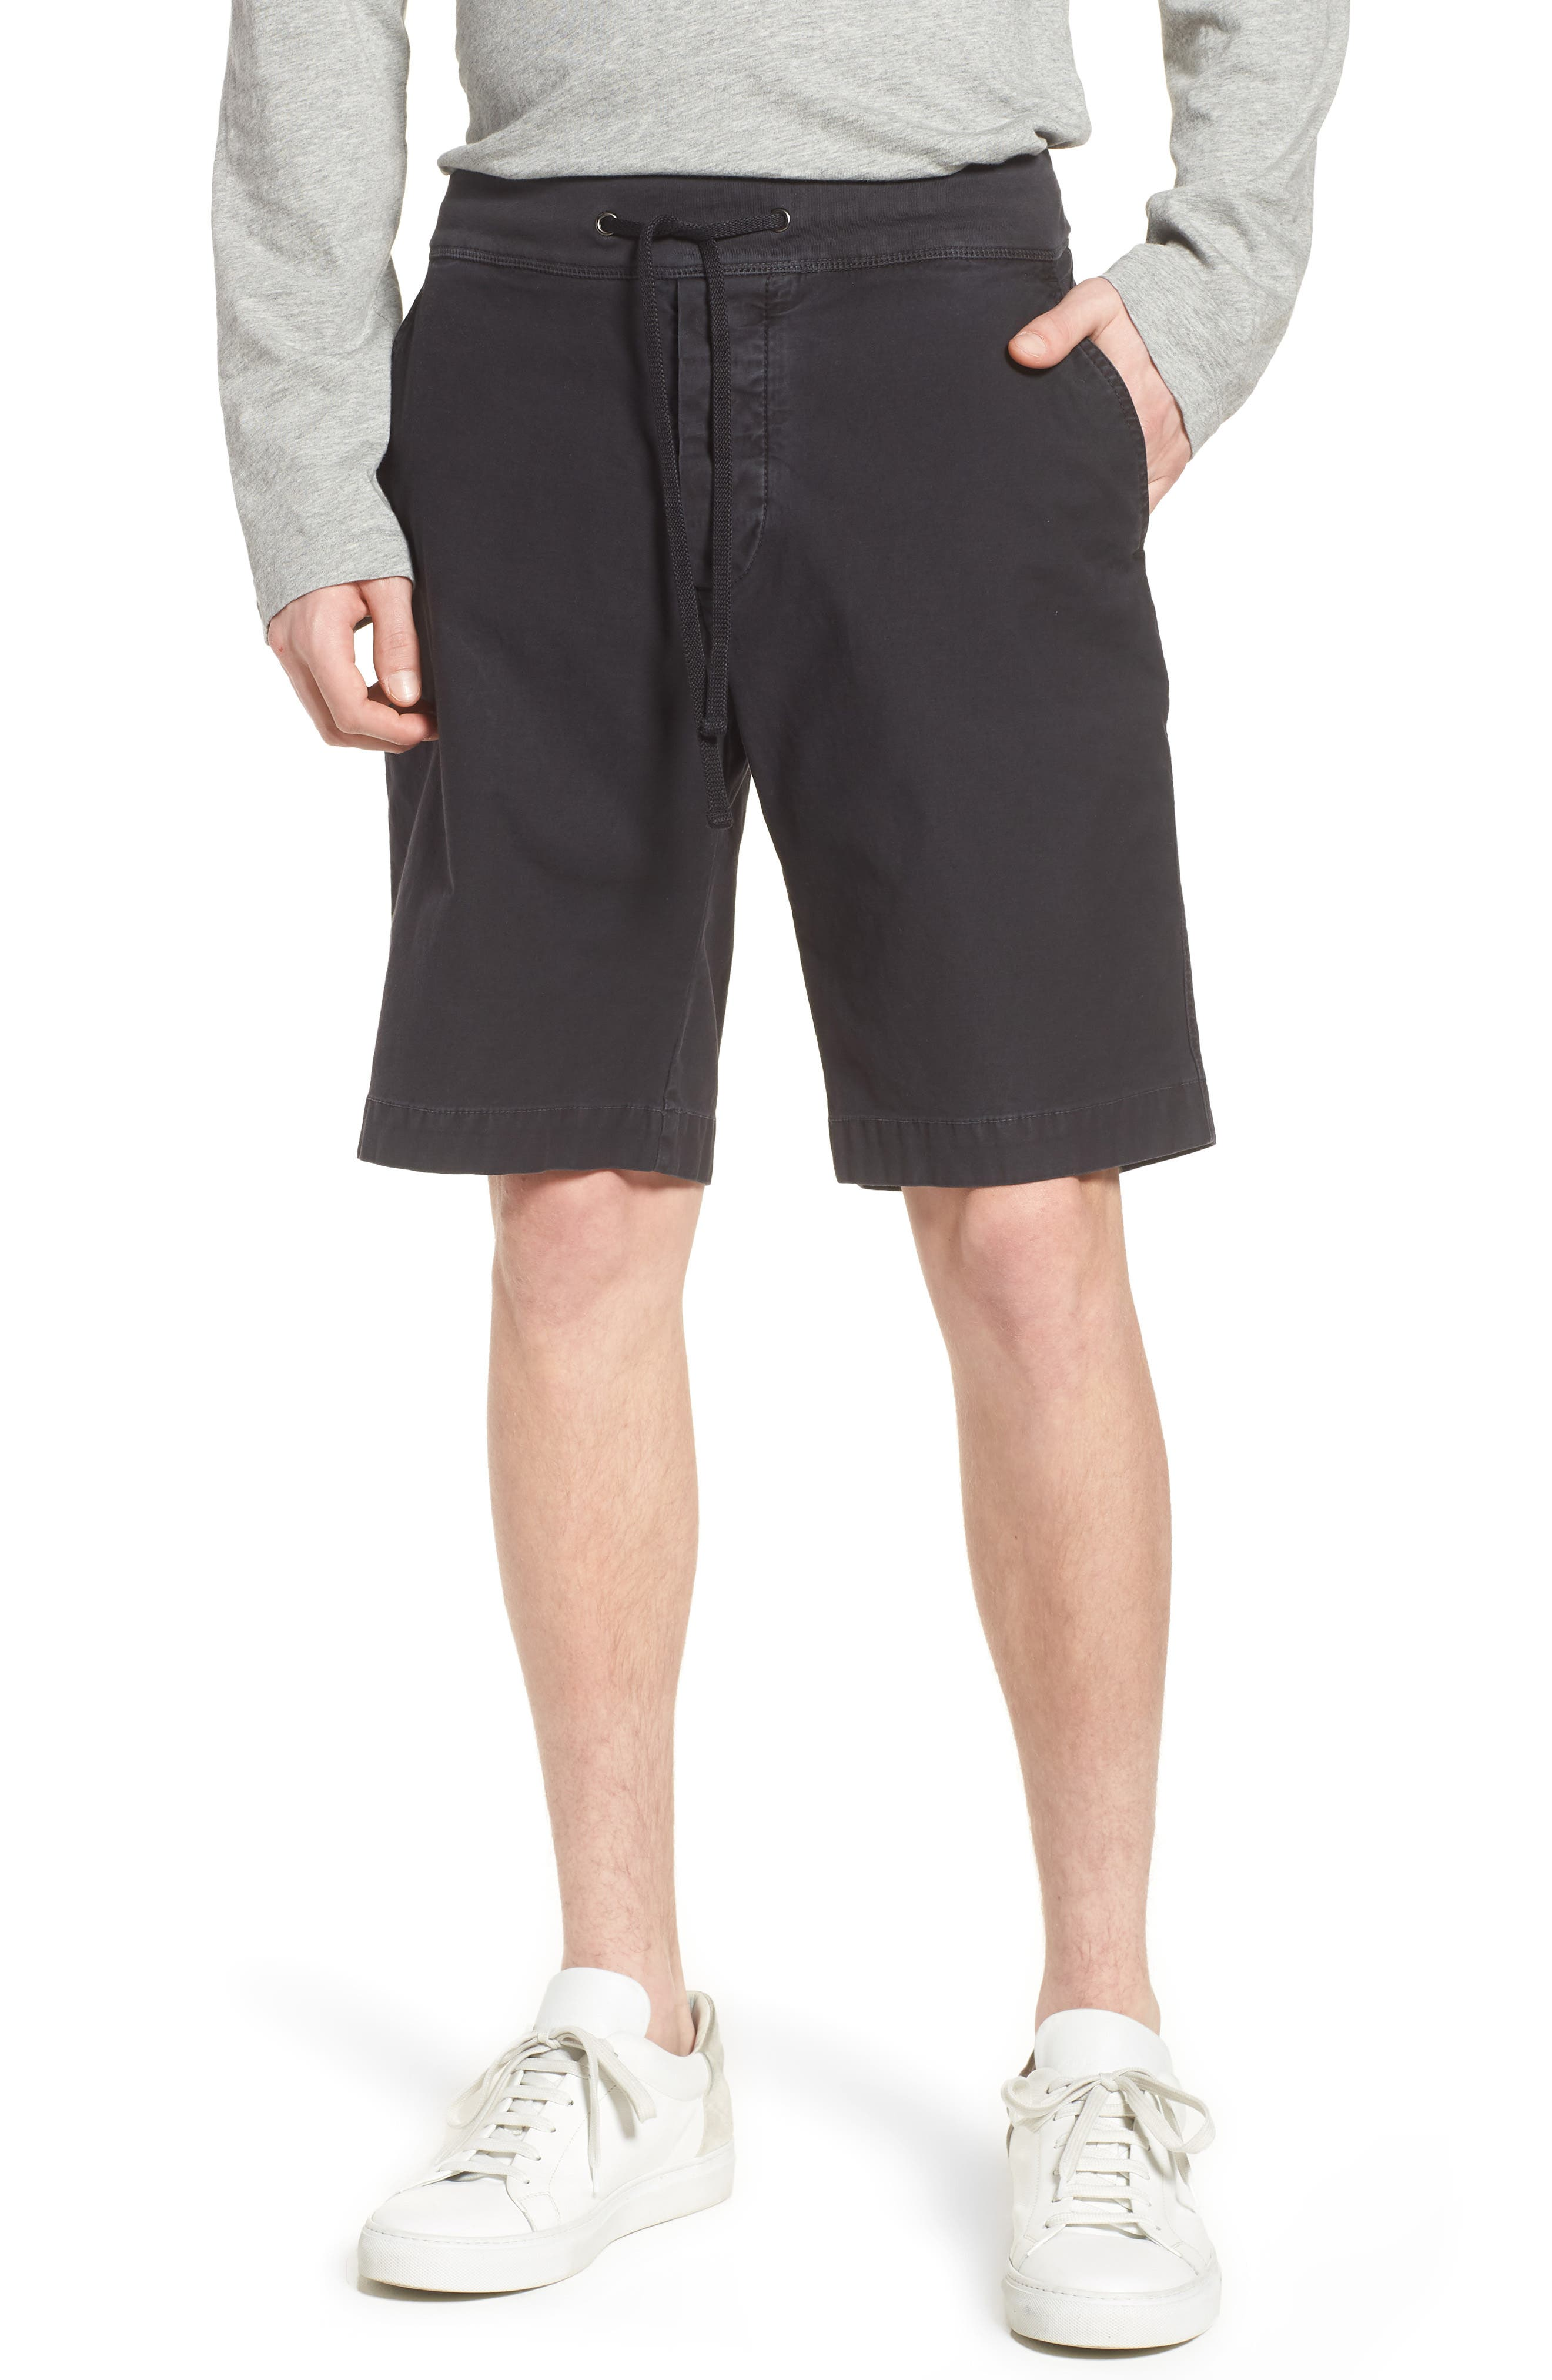 JAMES PERSE,                             Compact Stretch Cotton Shorts,                             Main thumbnail 1, color,                             020